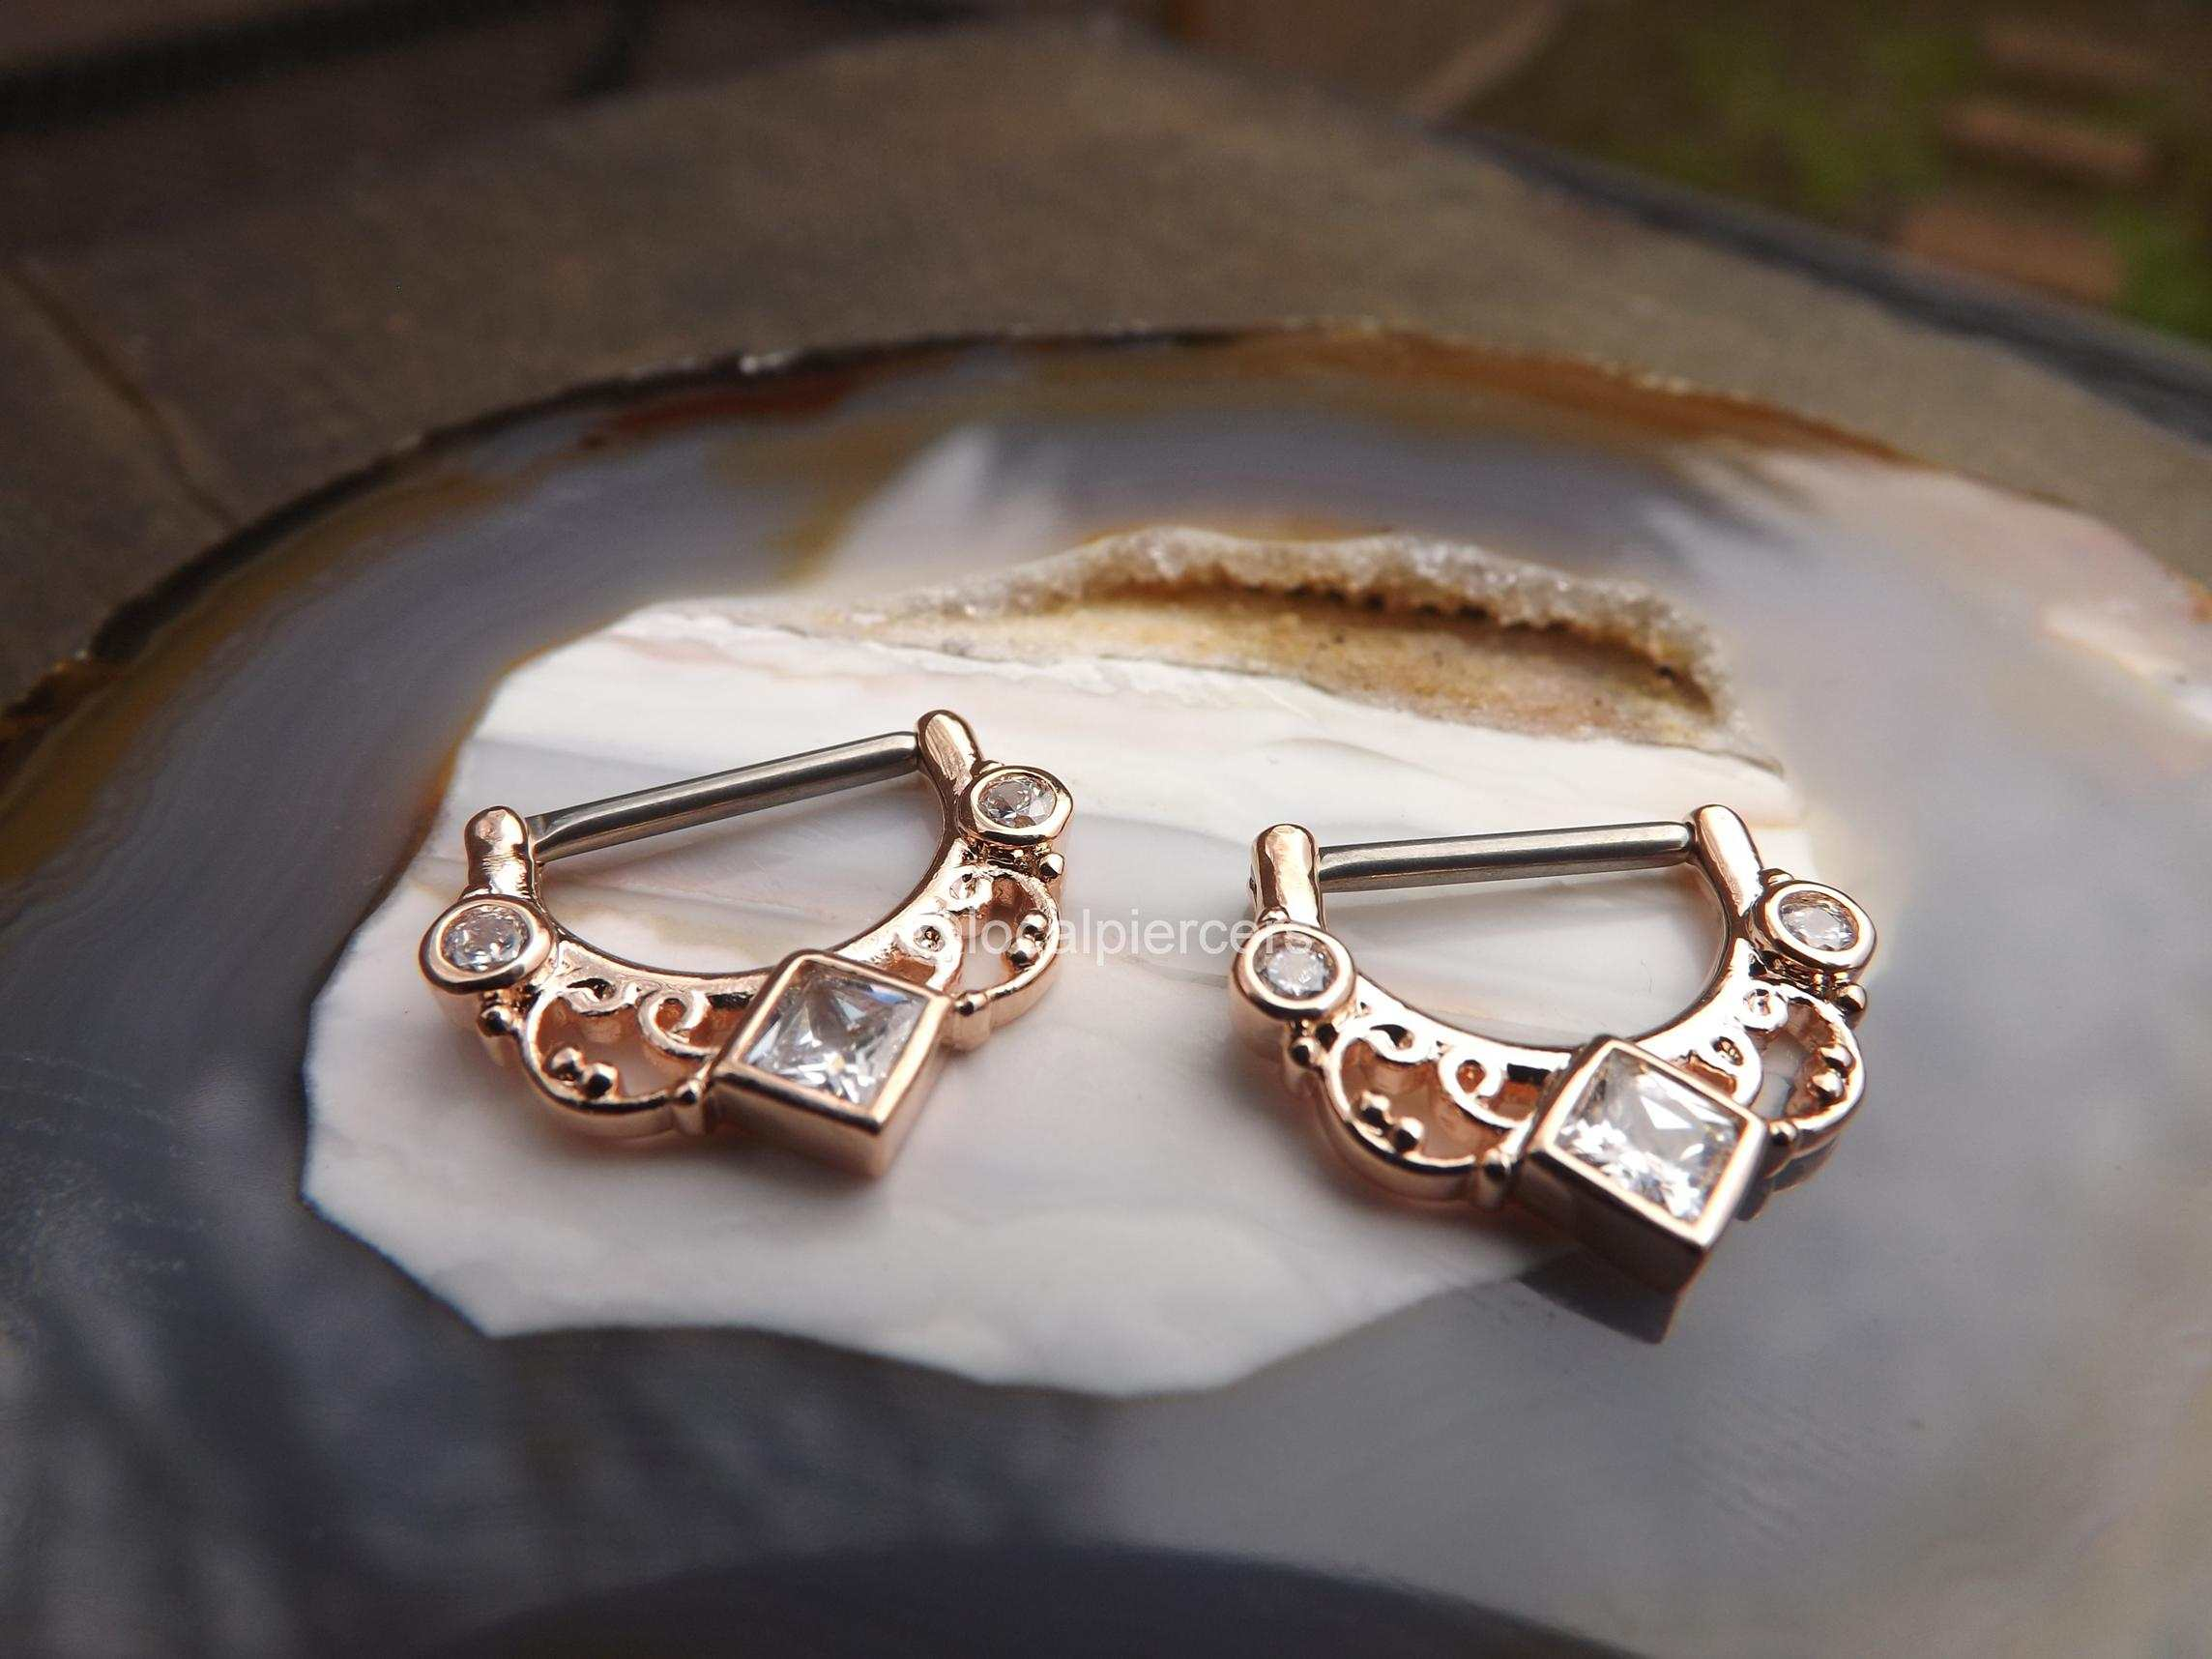 "14g Rose Gold Nipple Rings 16g 1/2"" Hinged Clicker Pair"